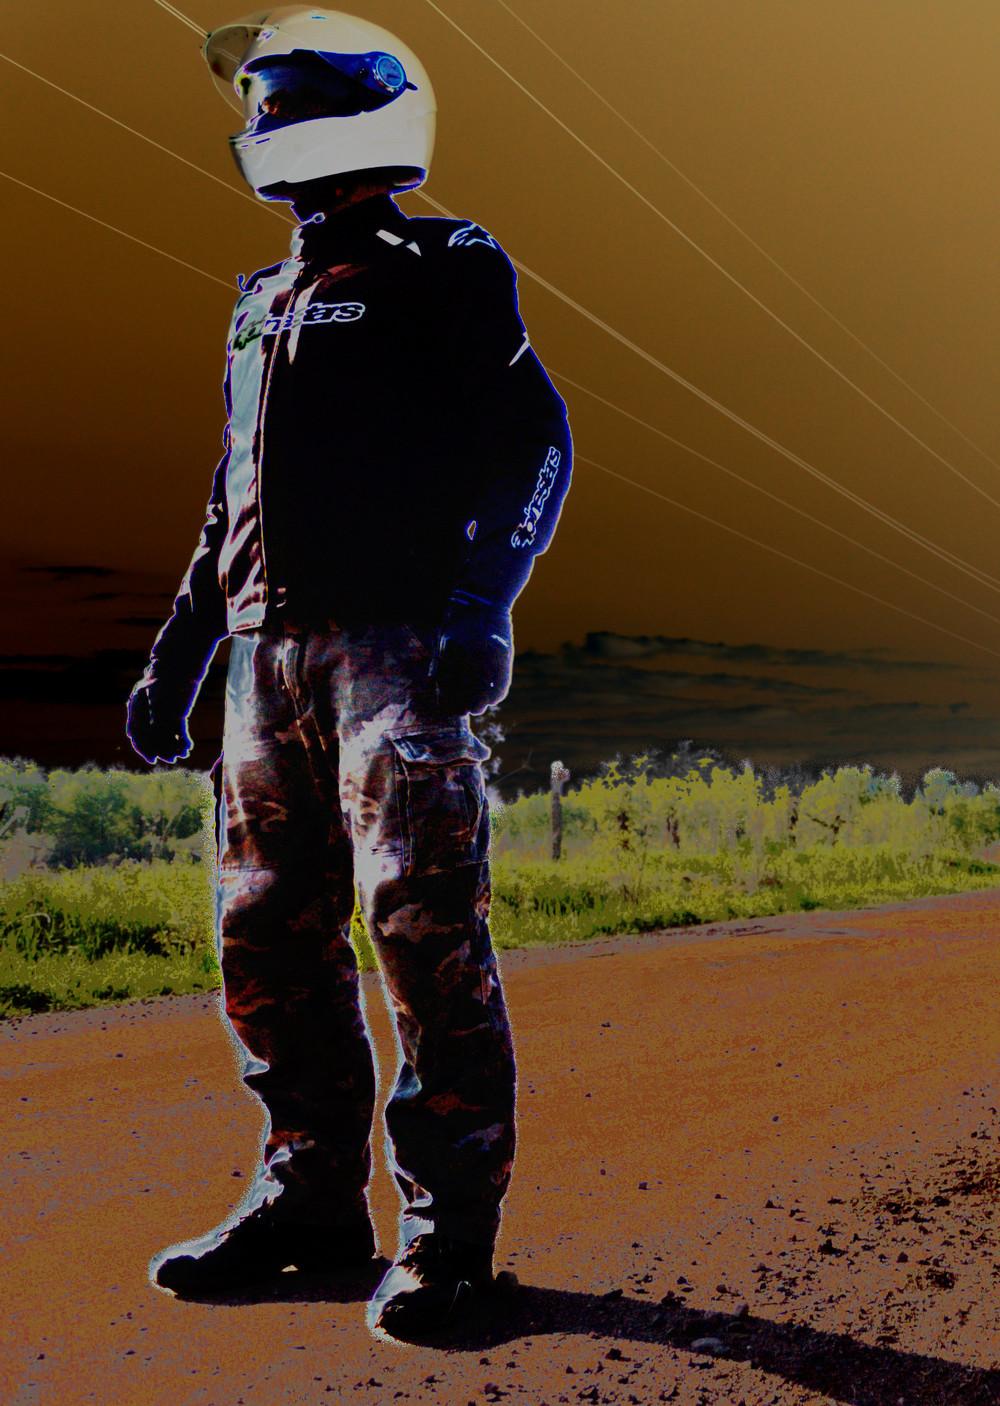 GIMP processed poster photograph.